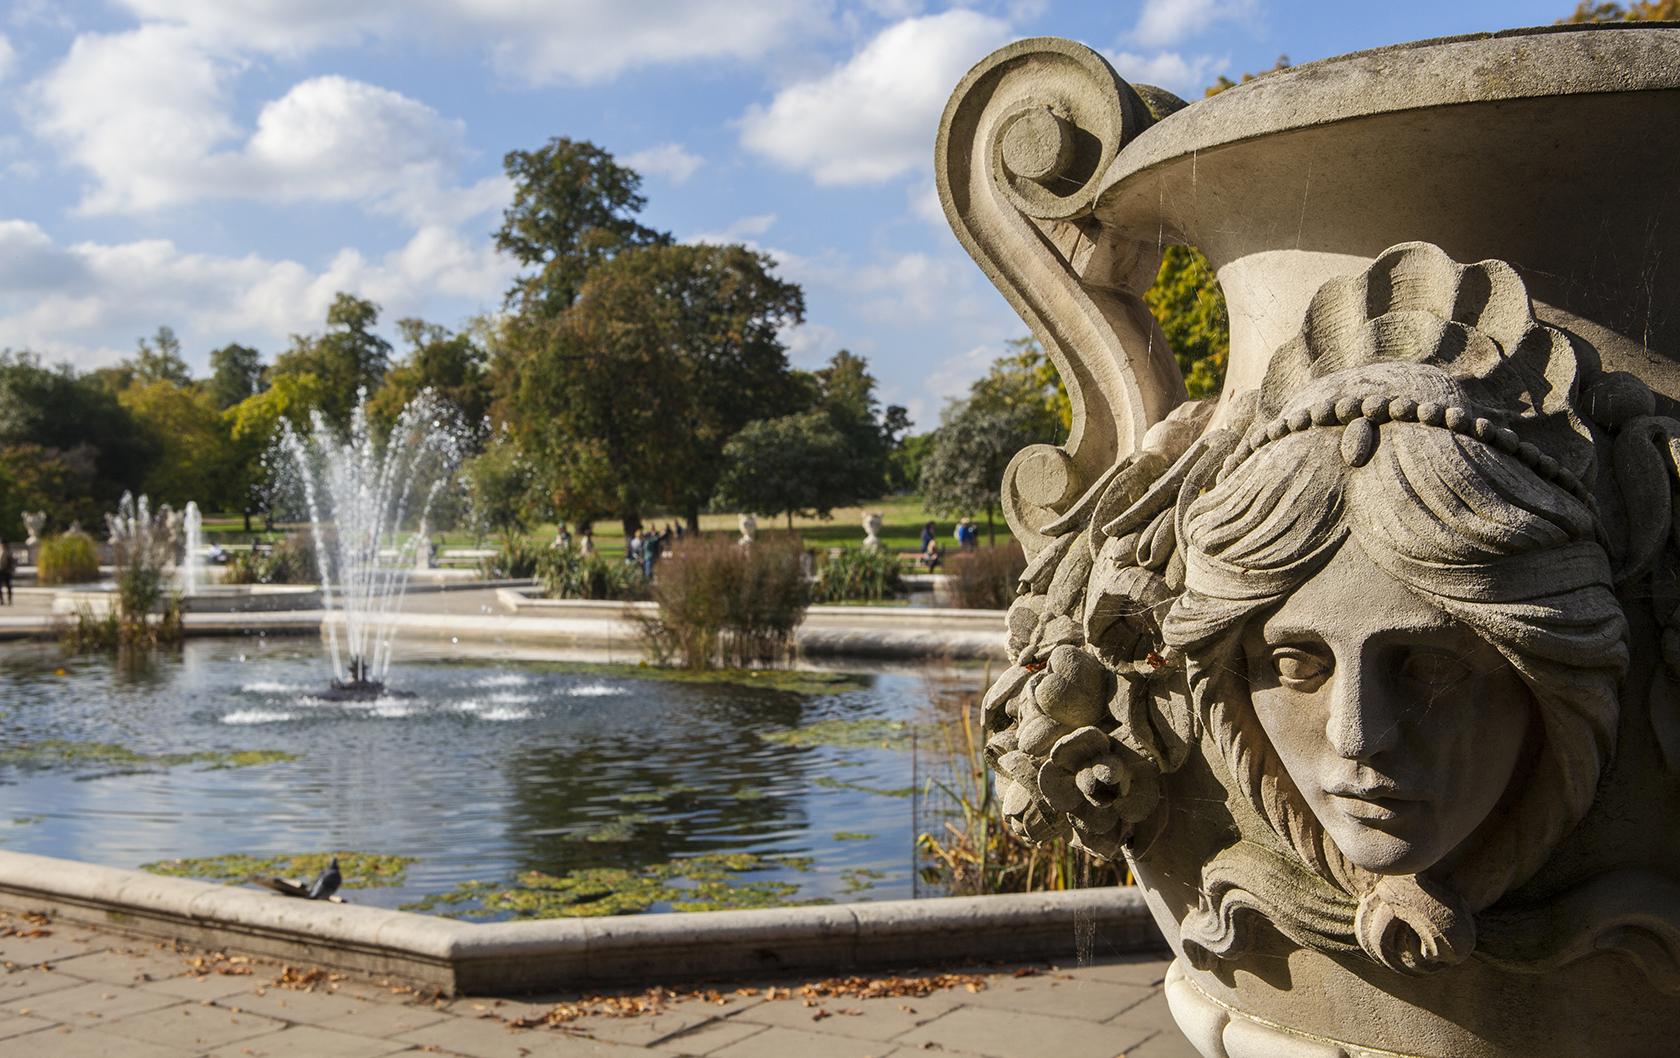 Italian Gardens in London's Kensington Gardens